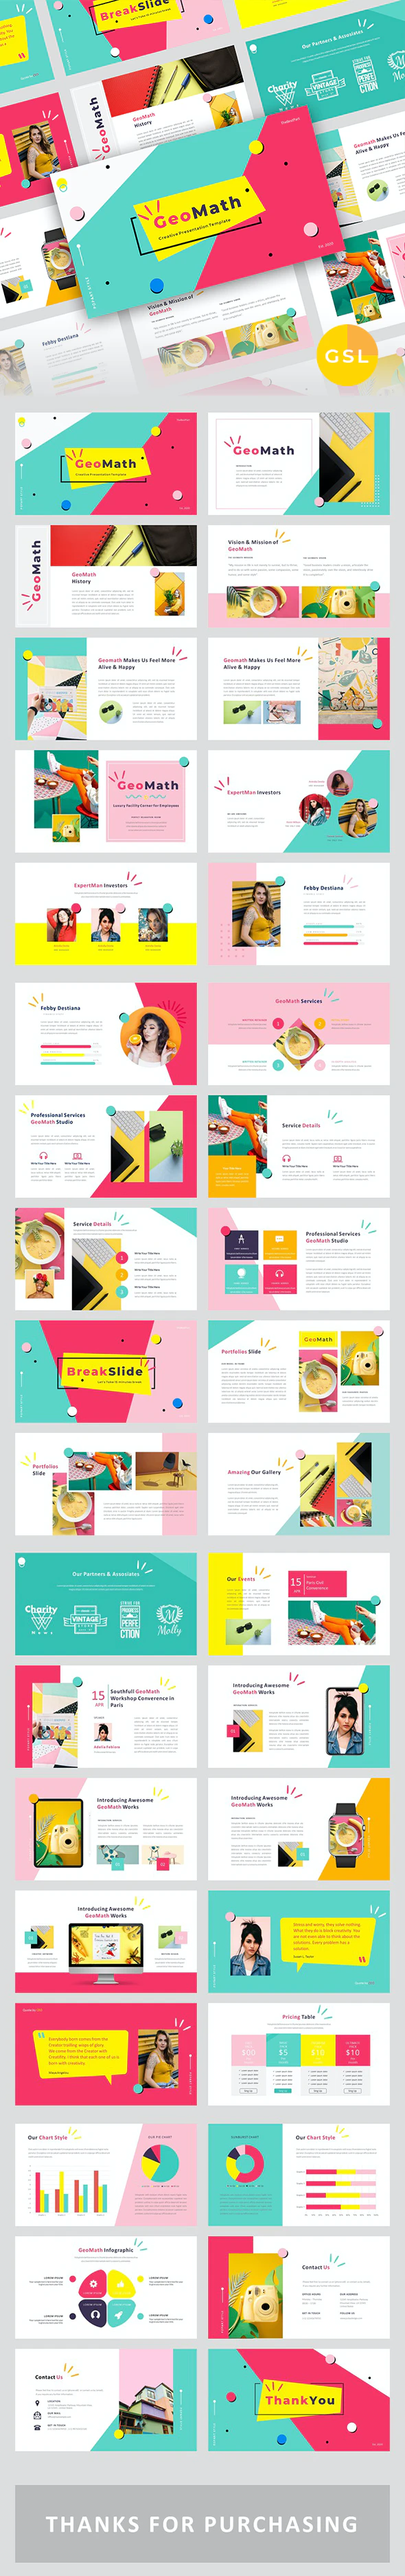 GeoMath – Creative Pop Art Business Google Slides Template by Juday_Design